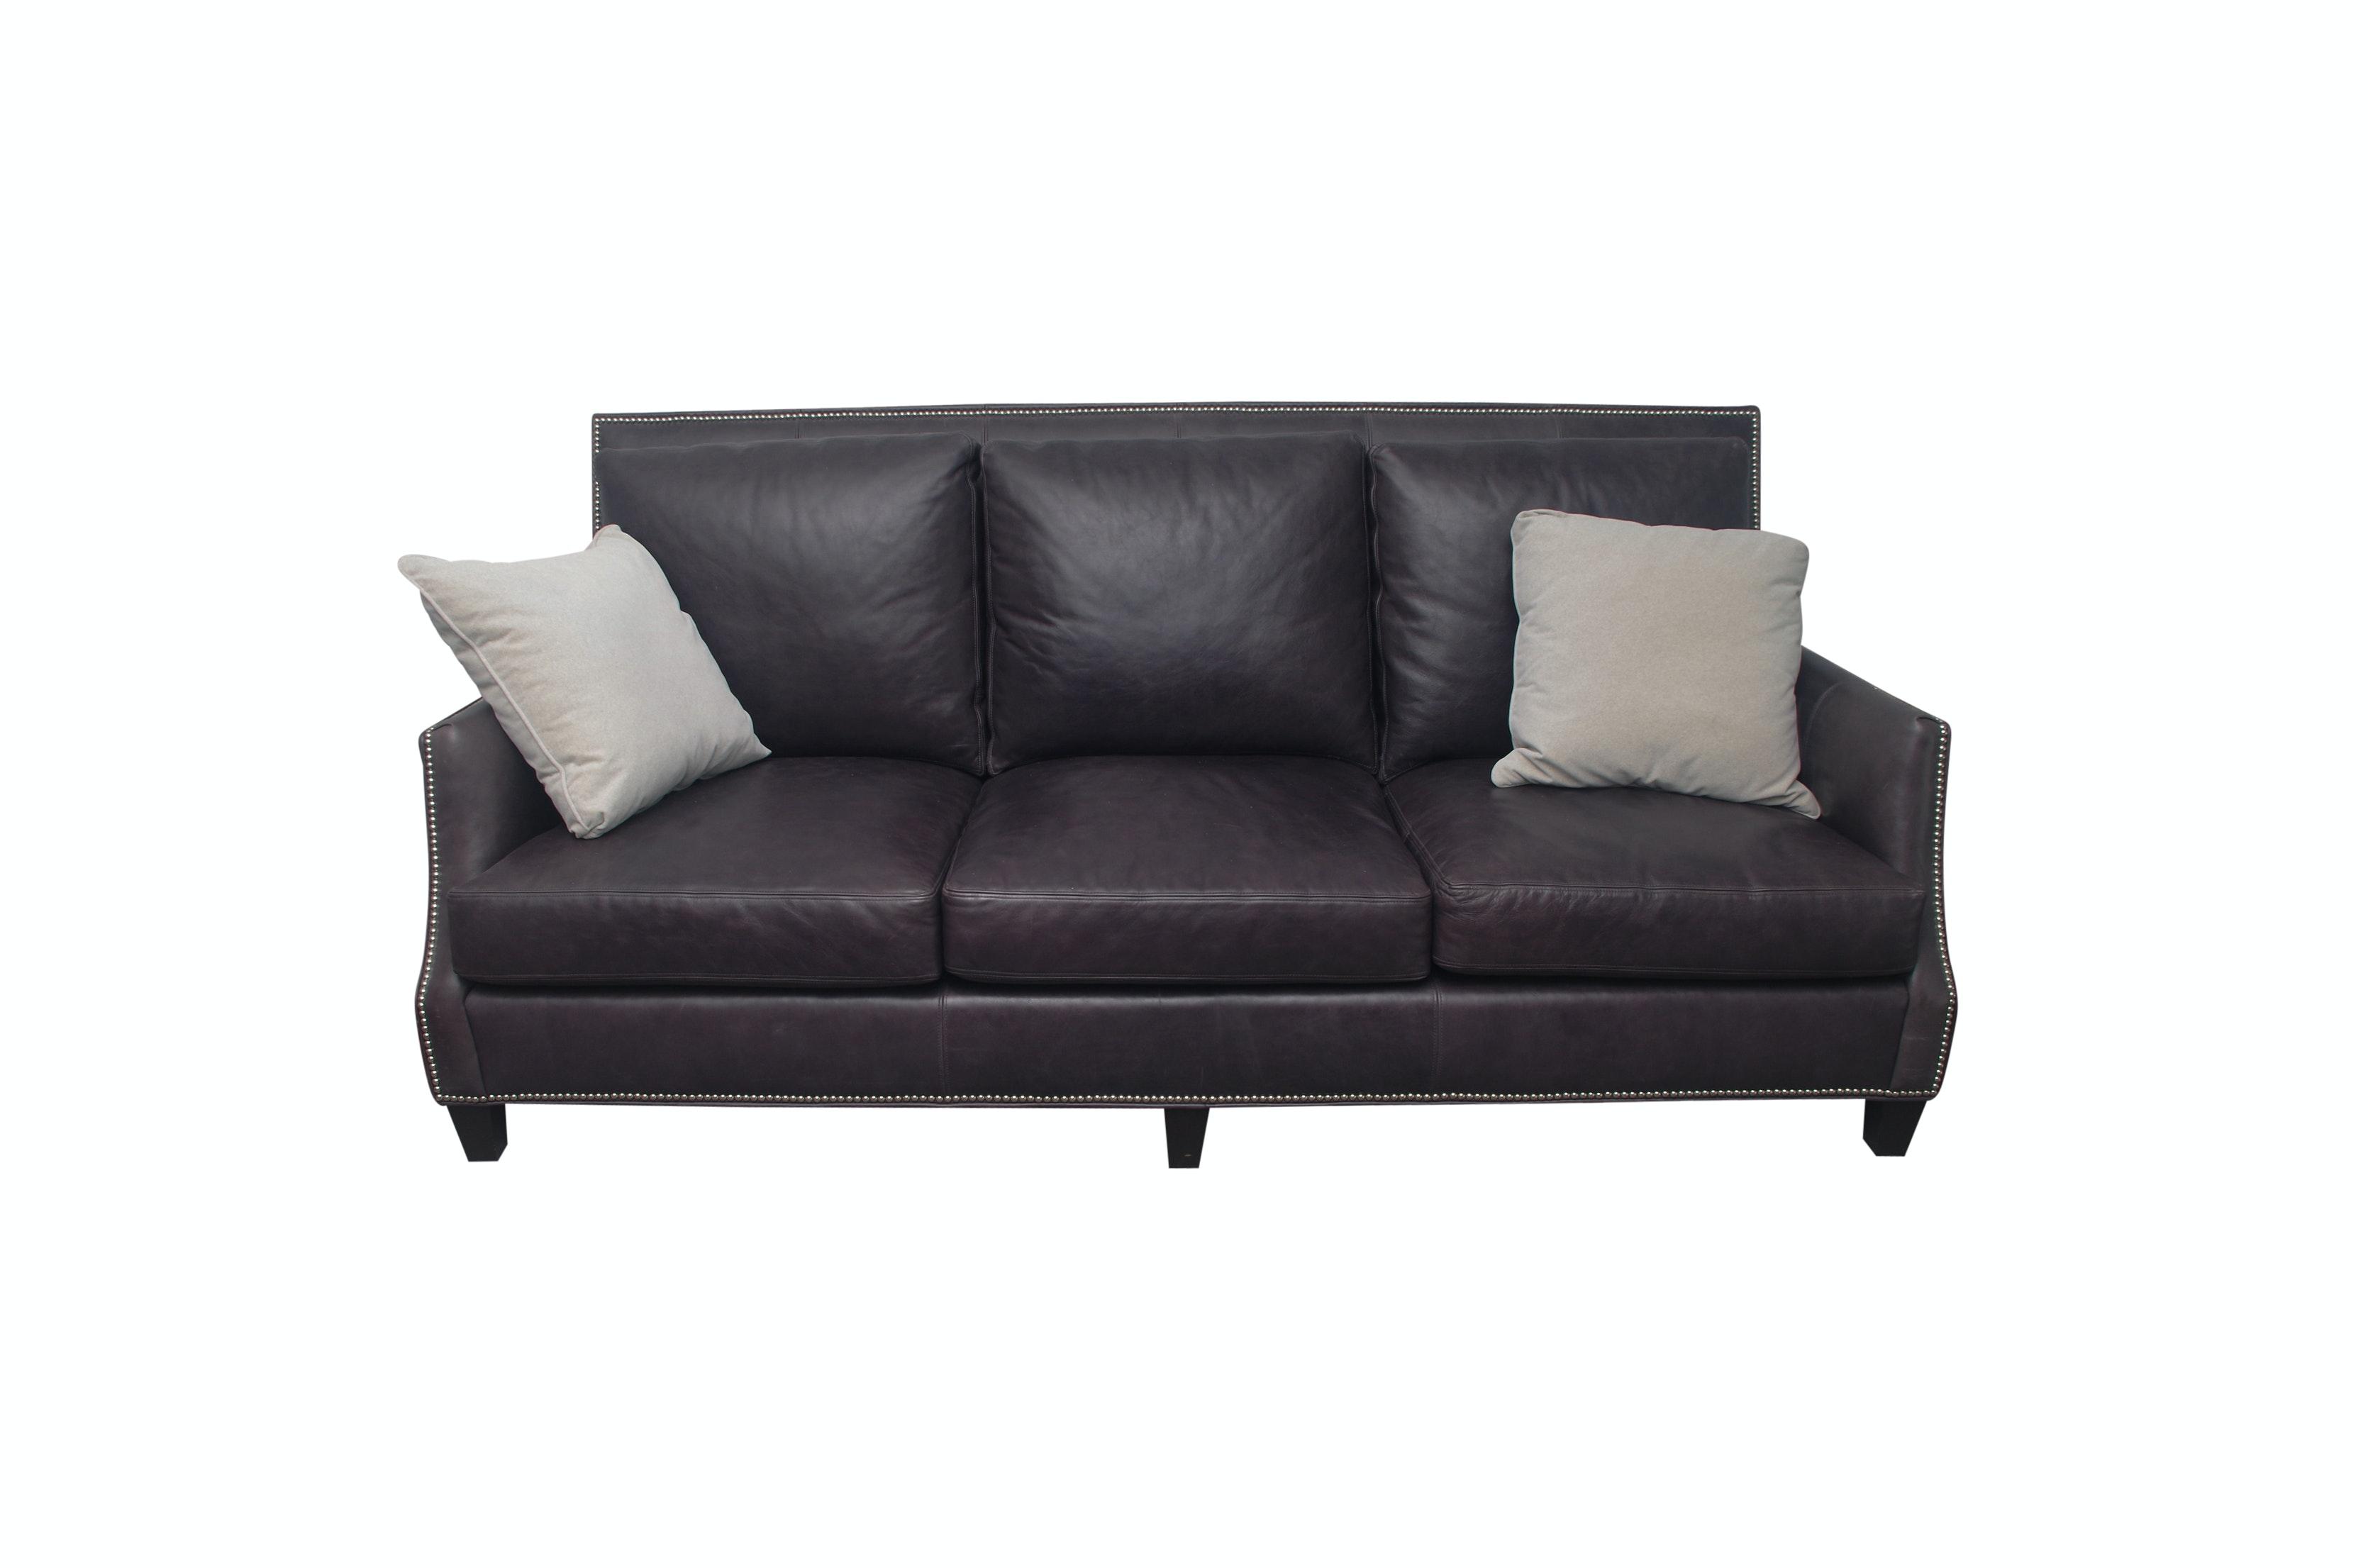 Arhaus Contemporary Leather Sofa